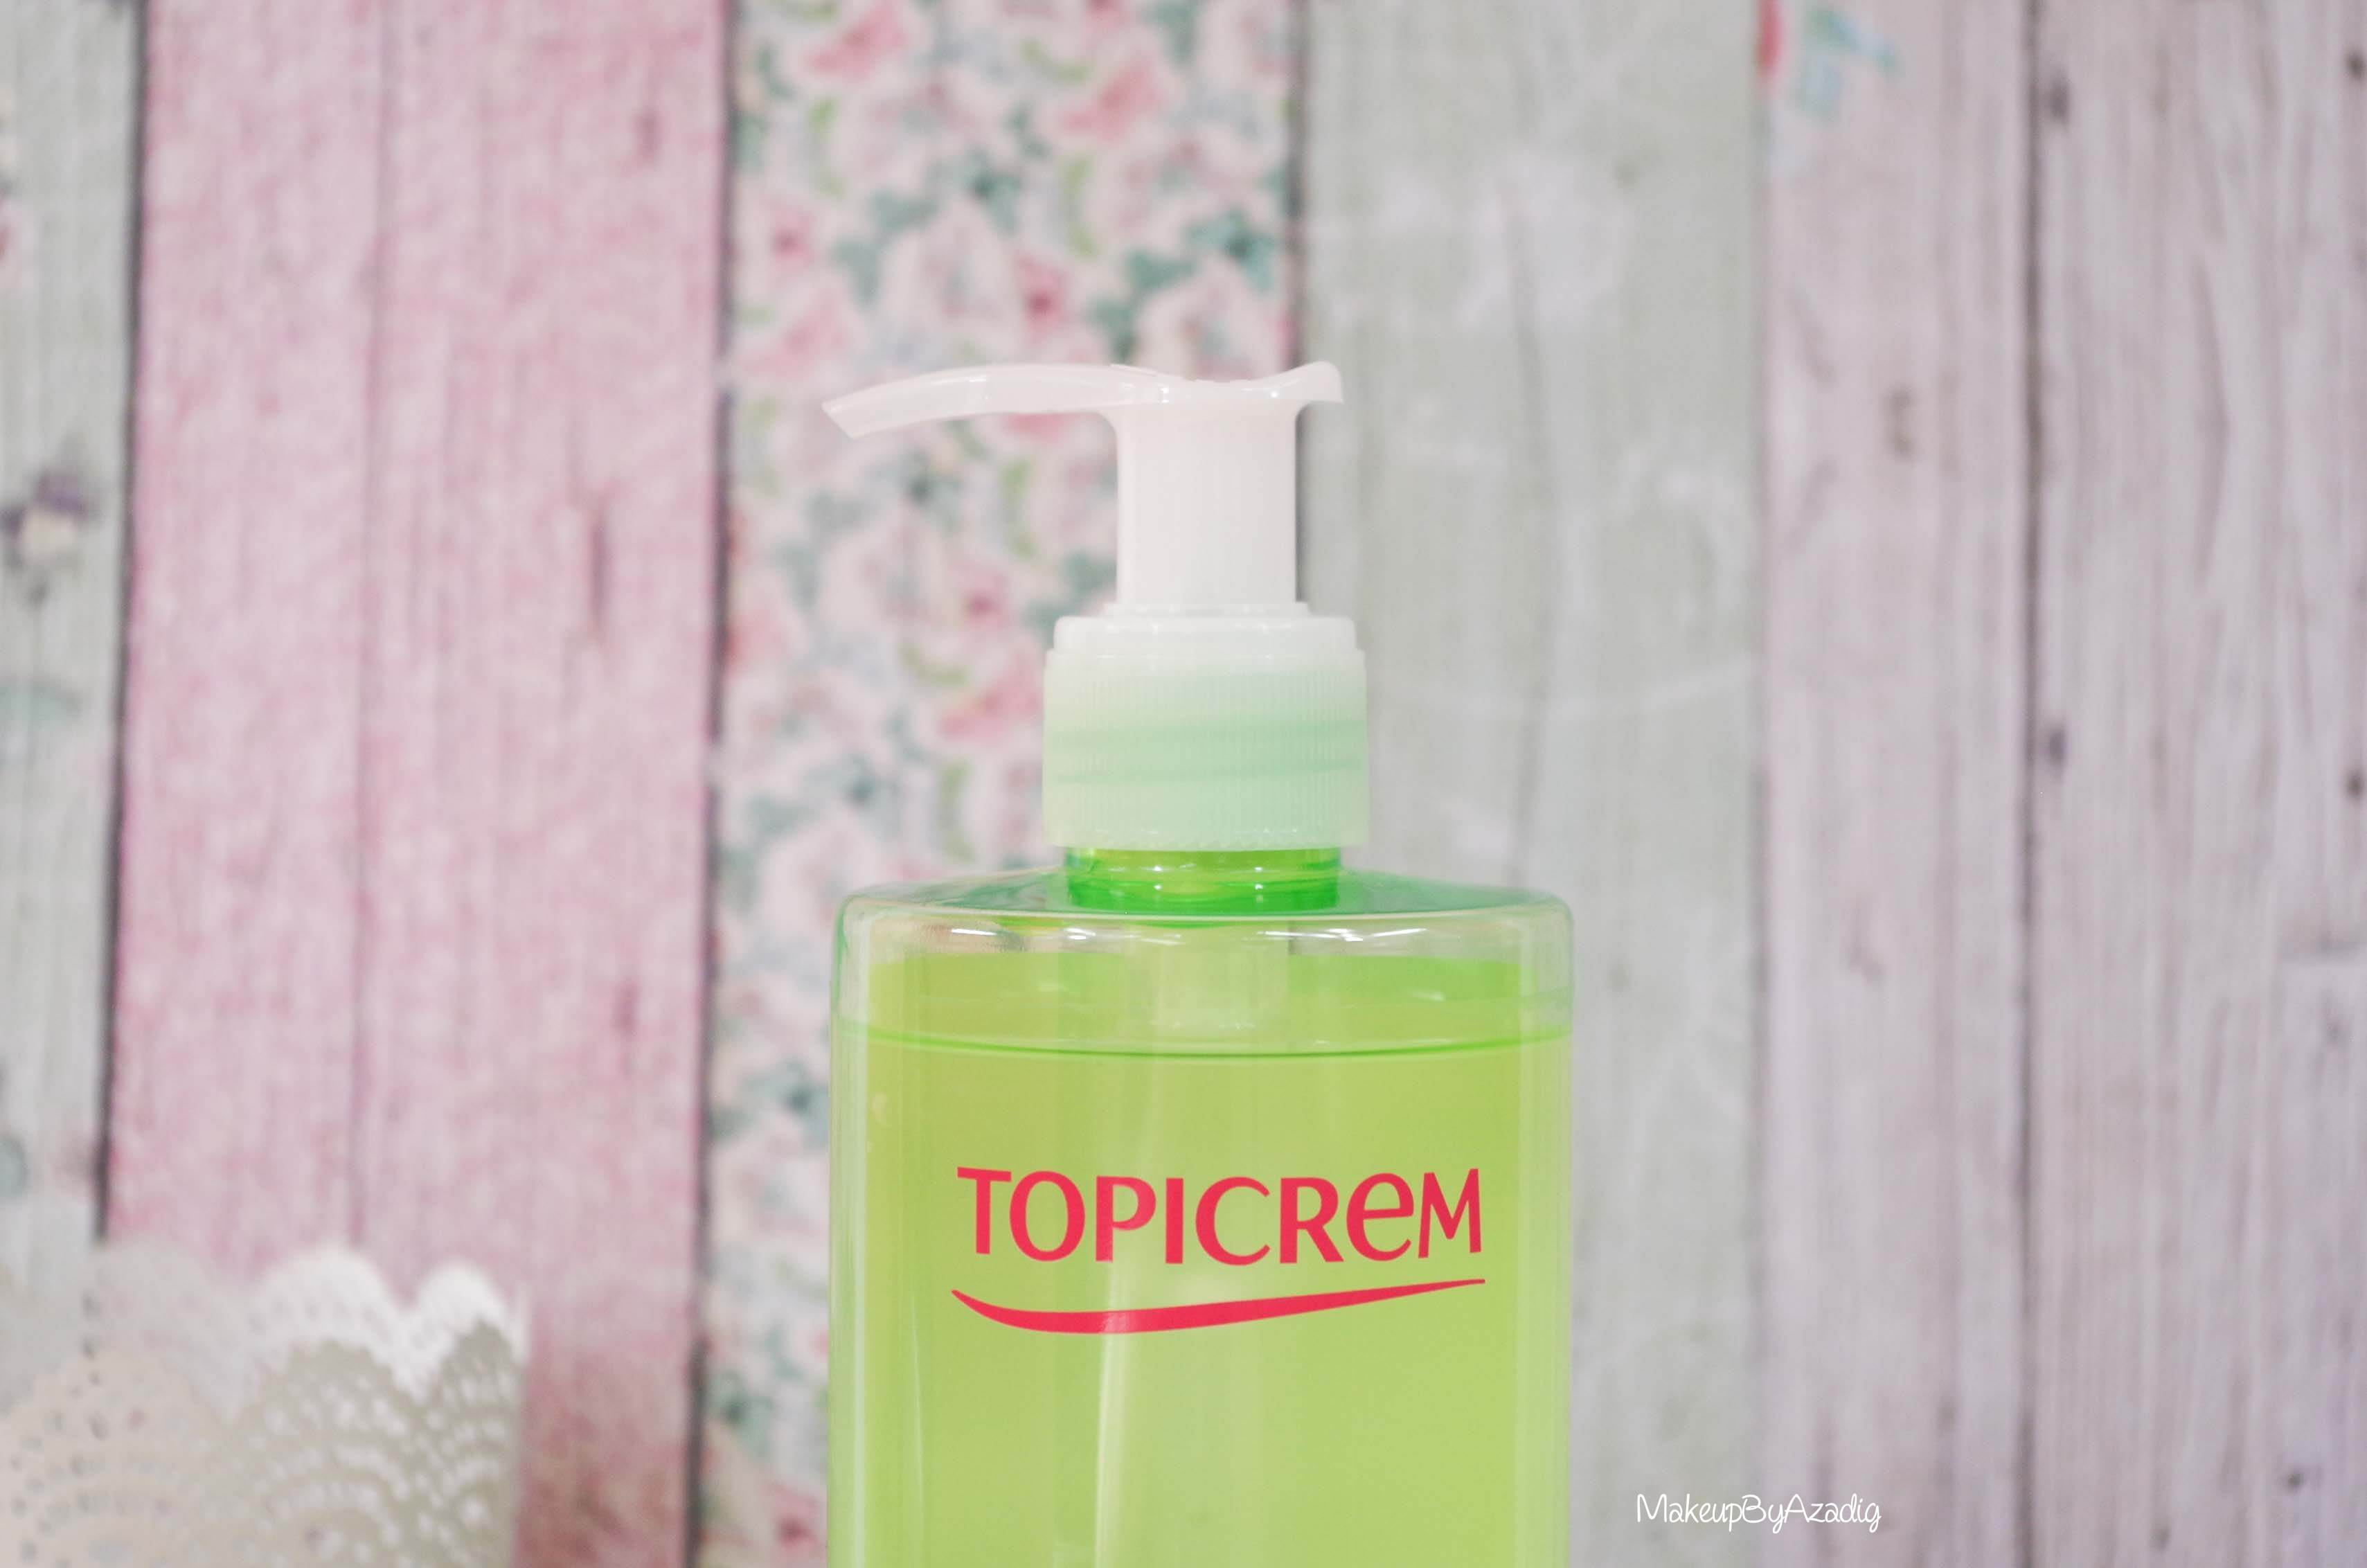 revue-gel-nettoyant-purifiant-demaquillage-visage-topicrem-makeupbyazadig-avis-prix-pas-cher-pompe